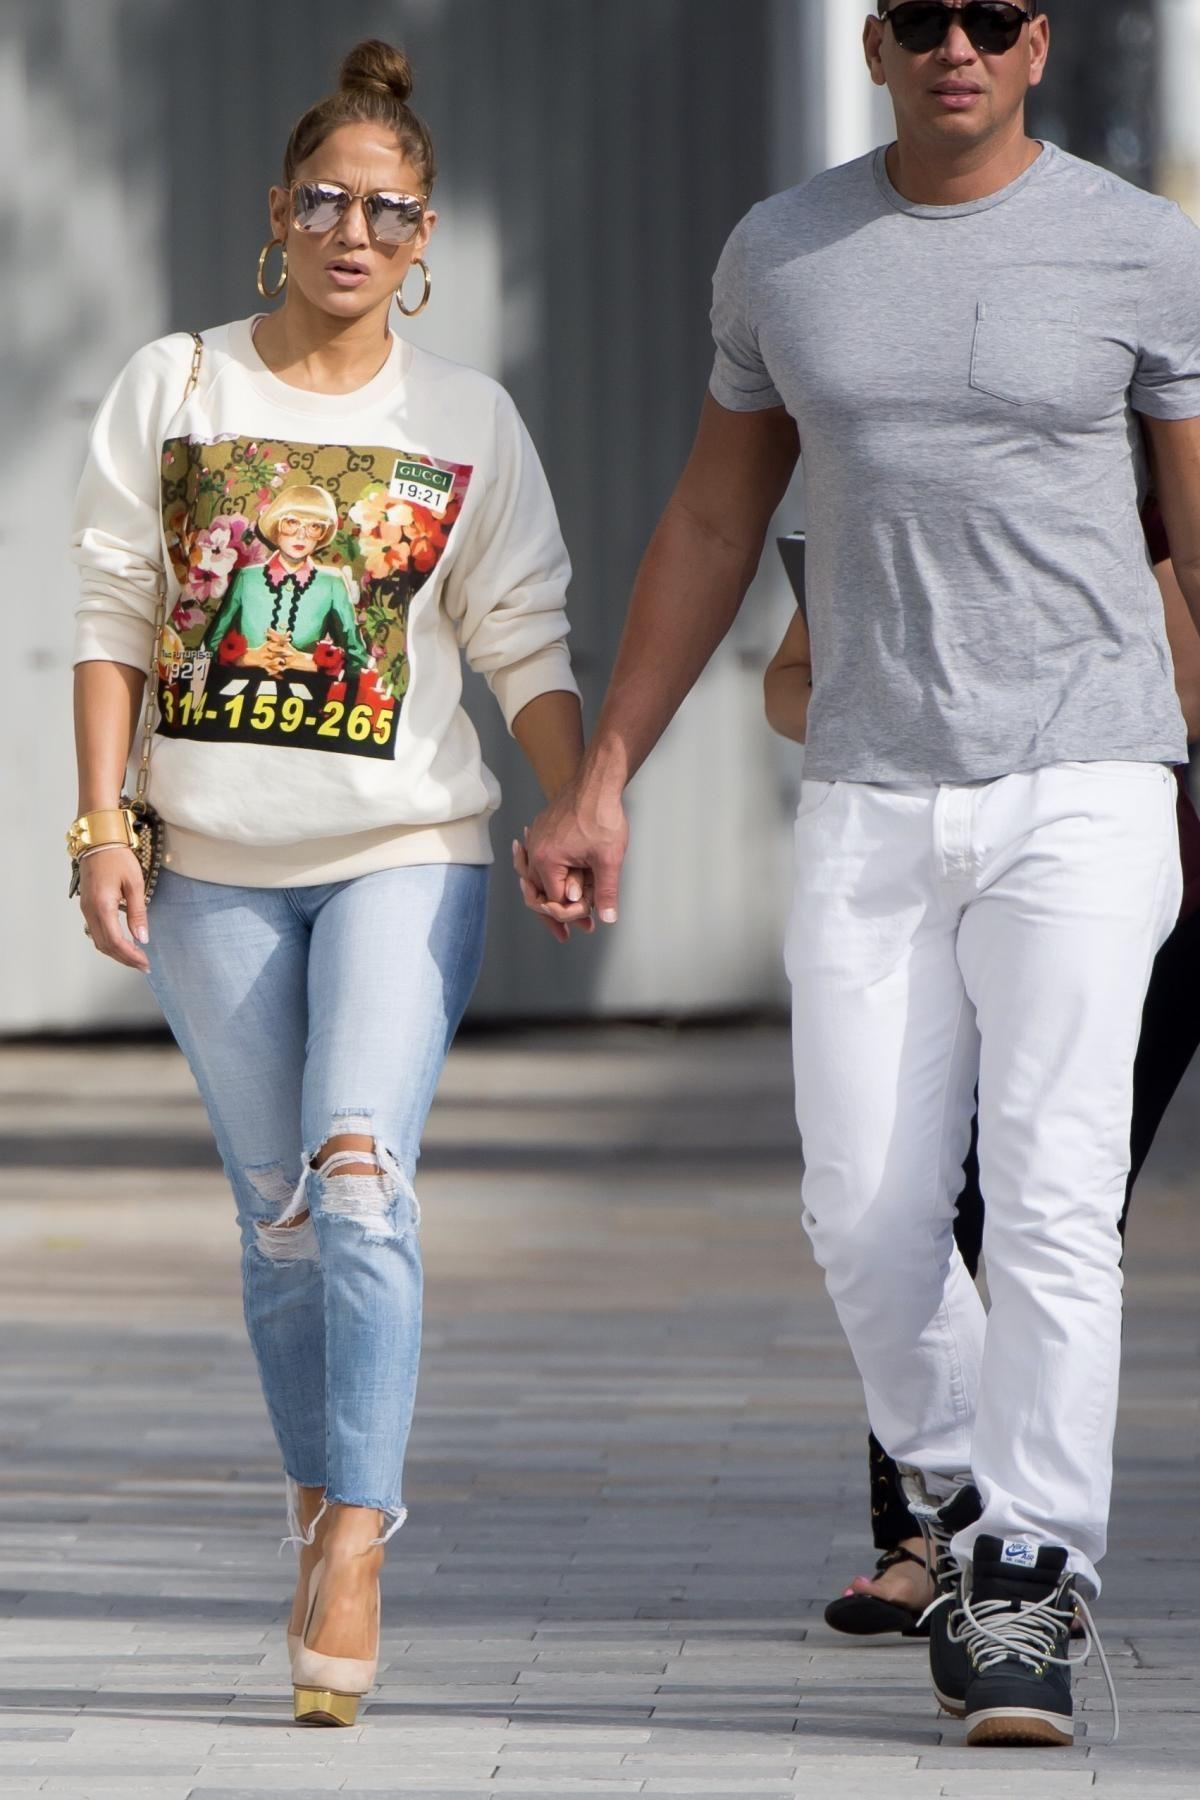 7629c7038f4 Jennifer Lopez wearing Charlotte Olympia Dolly Platform Pumps and Gucci  Ignasi Monreal Print Sweatshirt